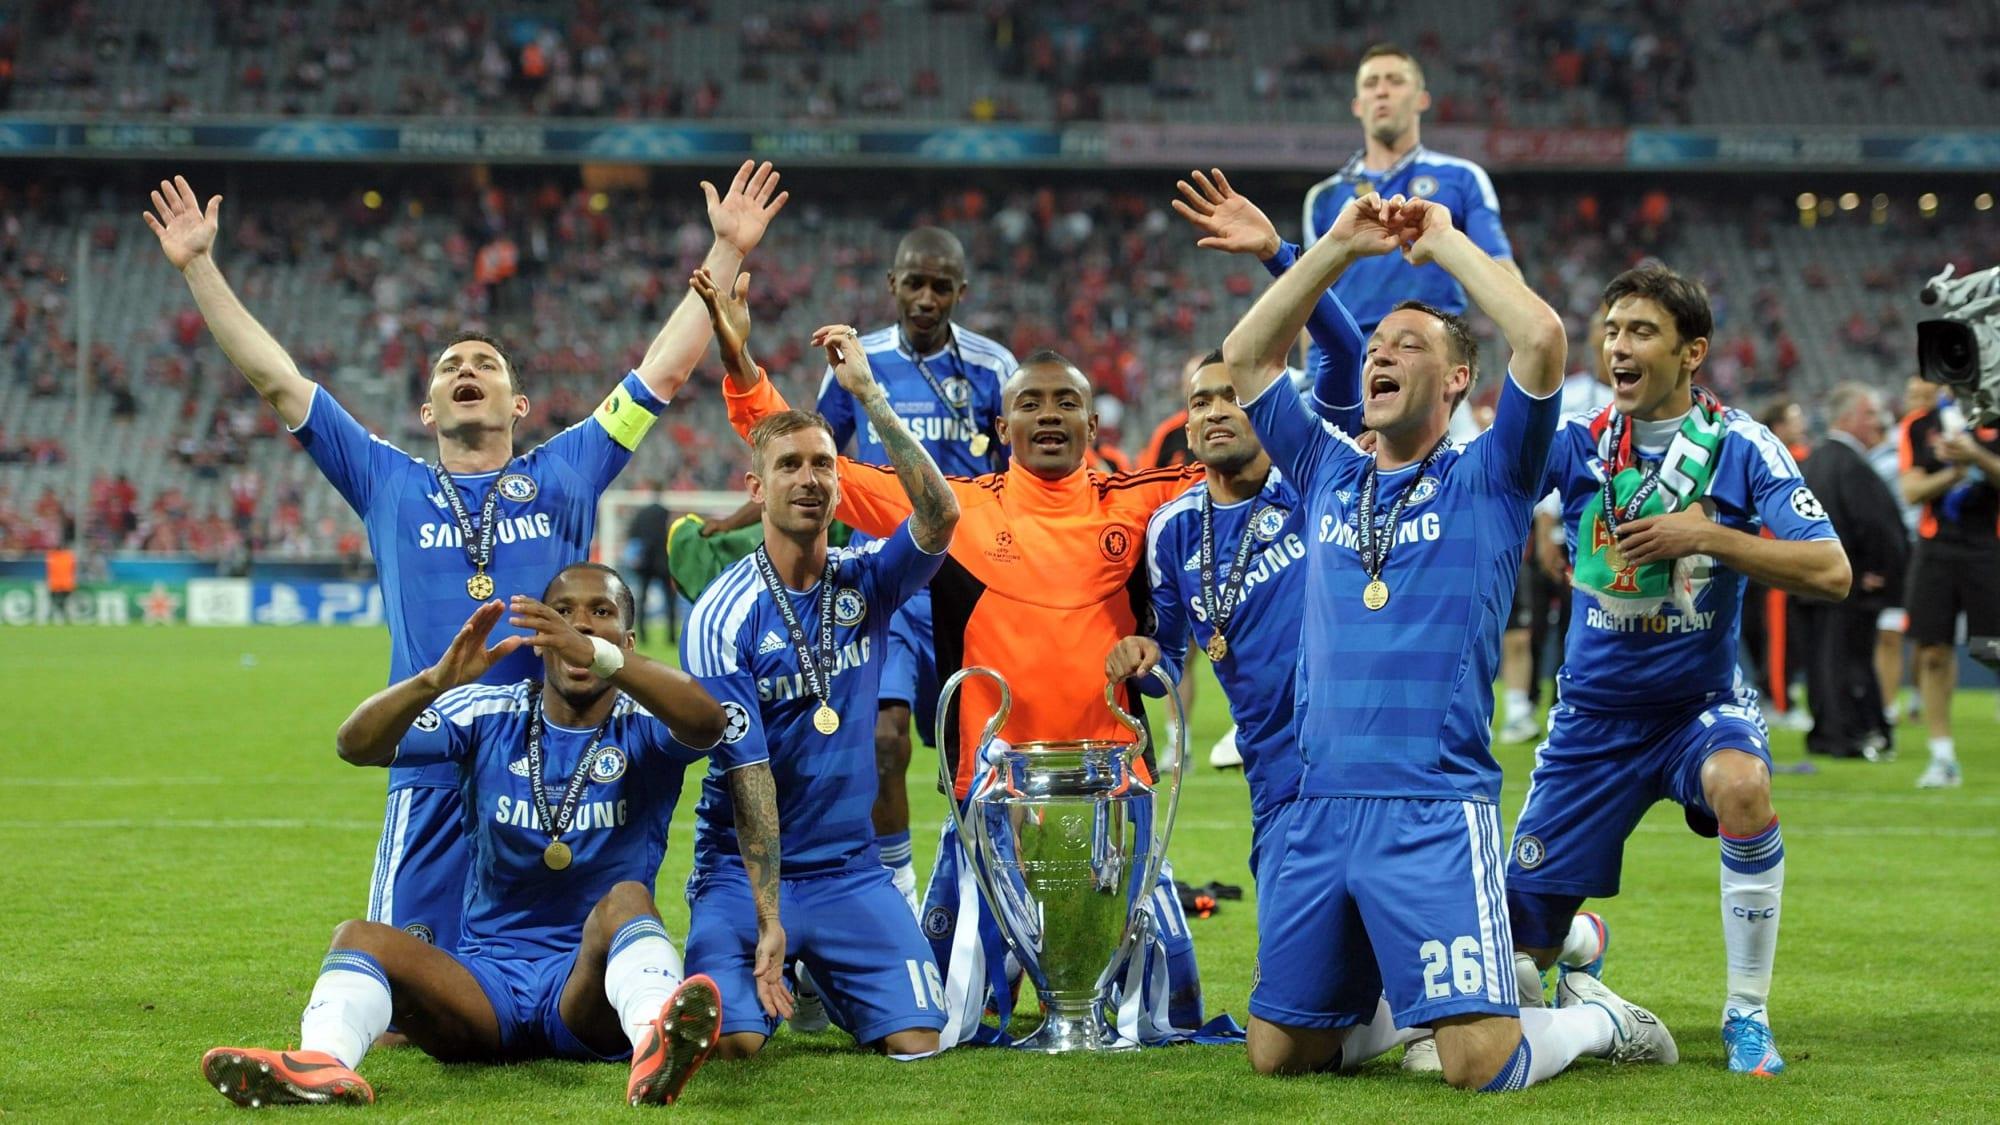 Champions League Ewige TorschГјtzenliste